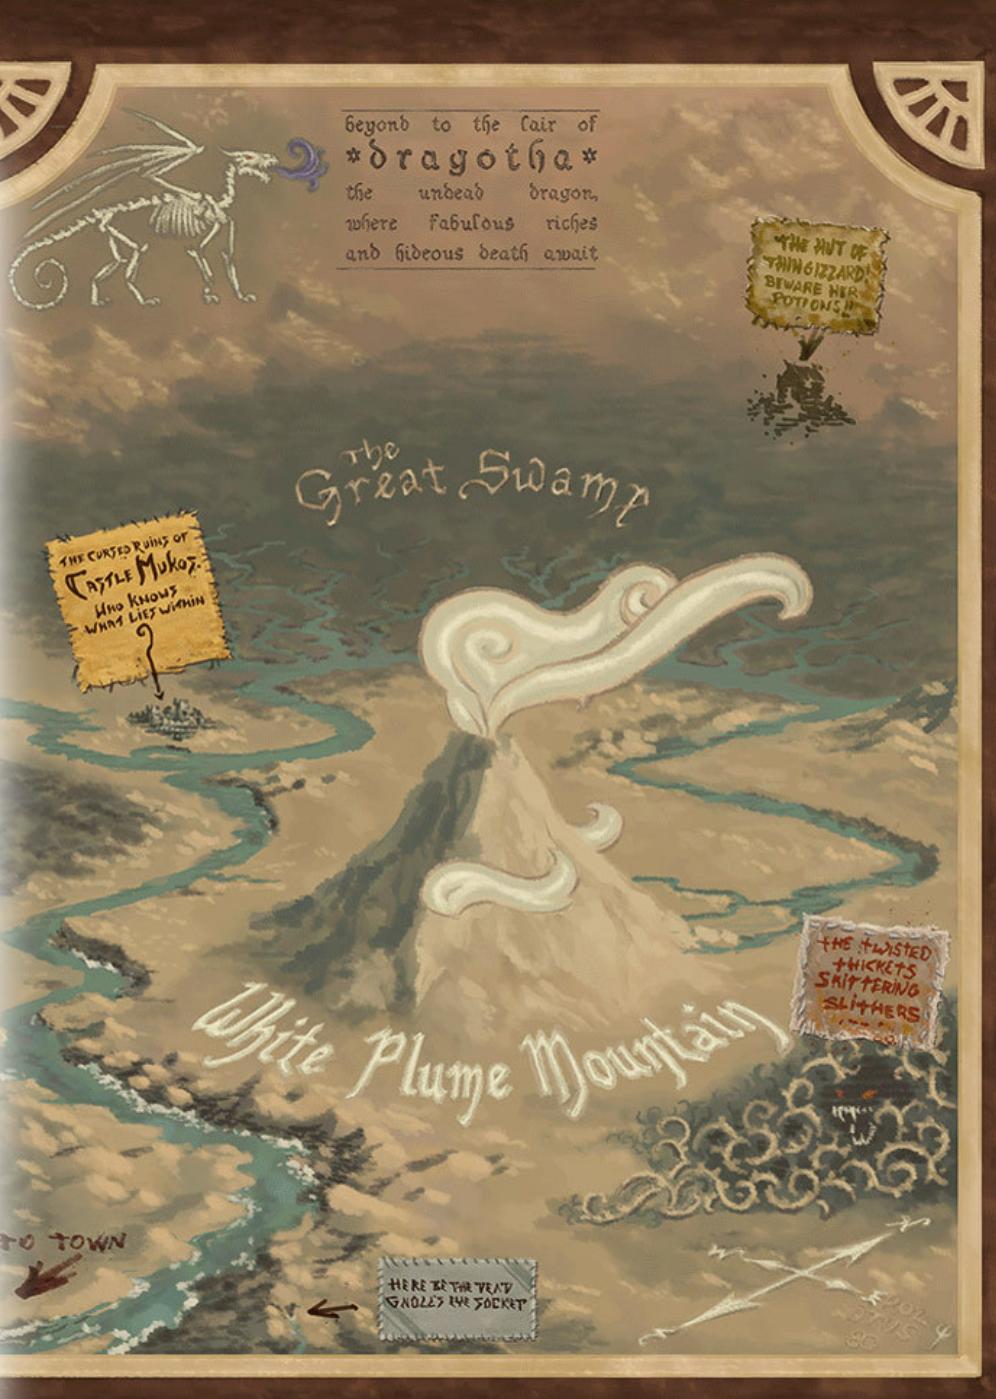 Cover of White Plume Mountain 5e